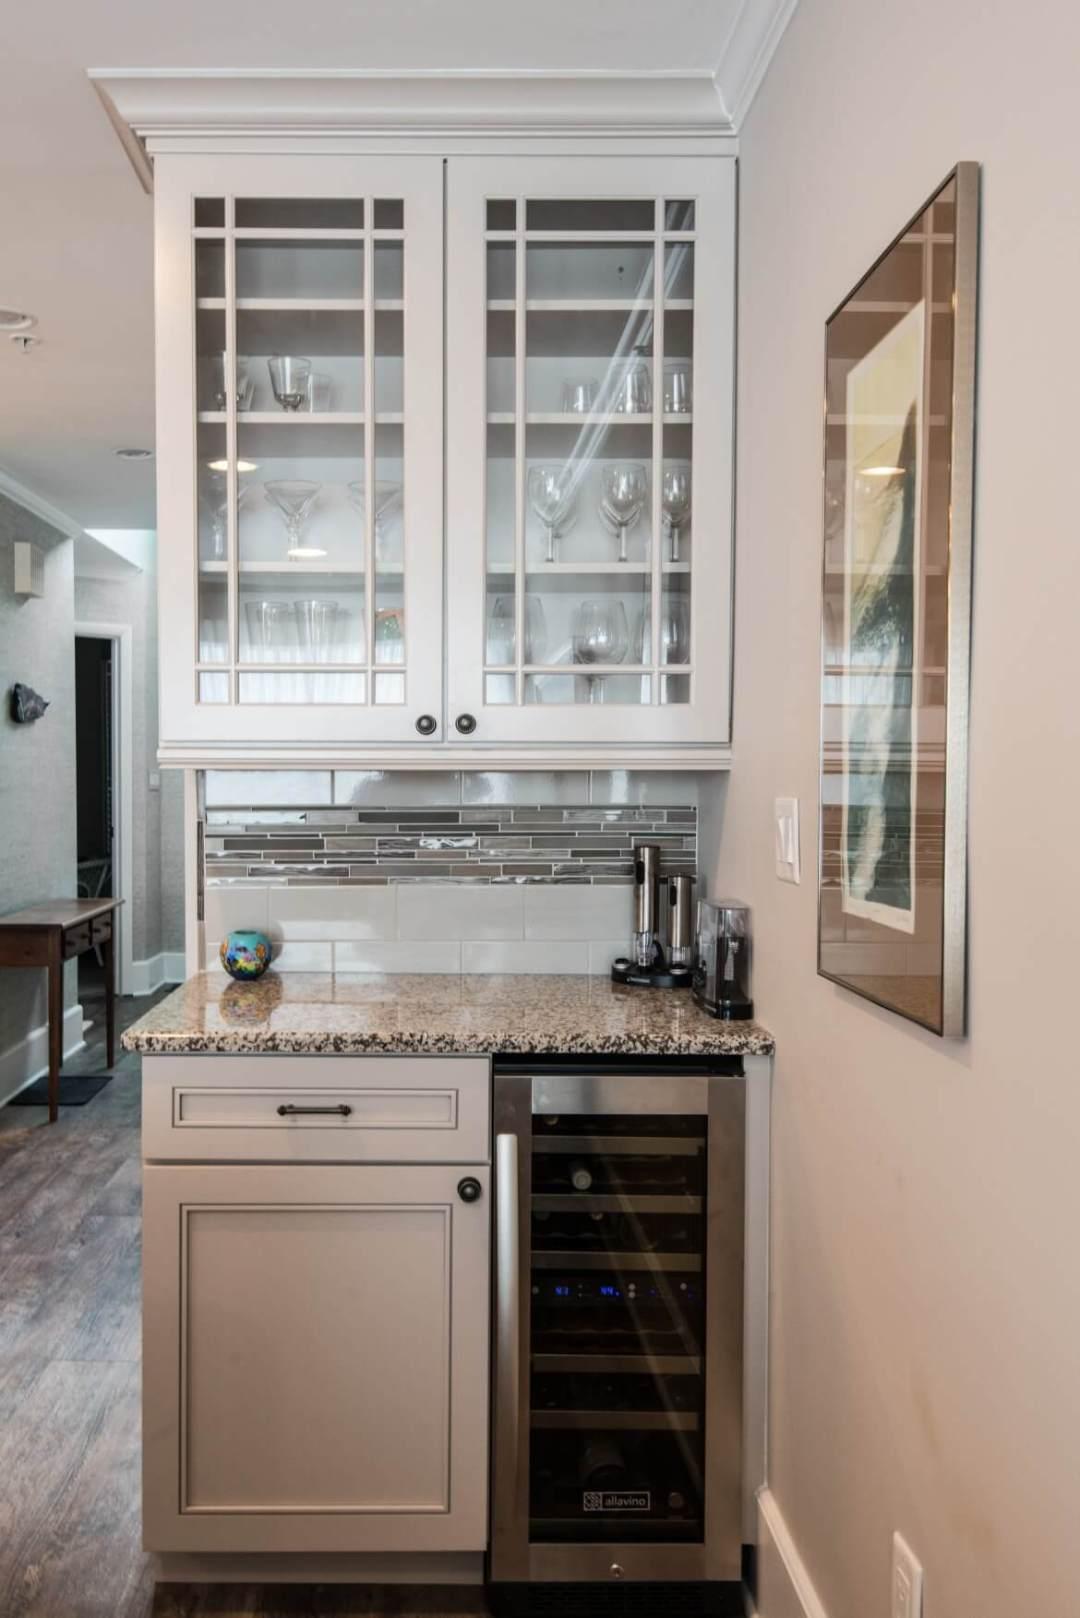 Kings Grant Renovation Vol.2 Fenwick Island, DE Kitchen Beverage Center with Granite Countertop and White Glass Cabinets